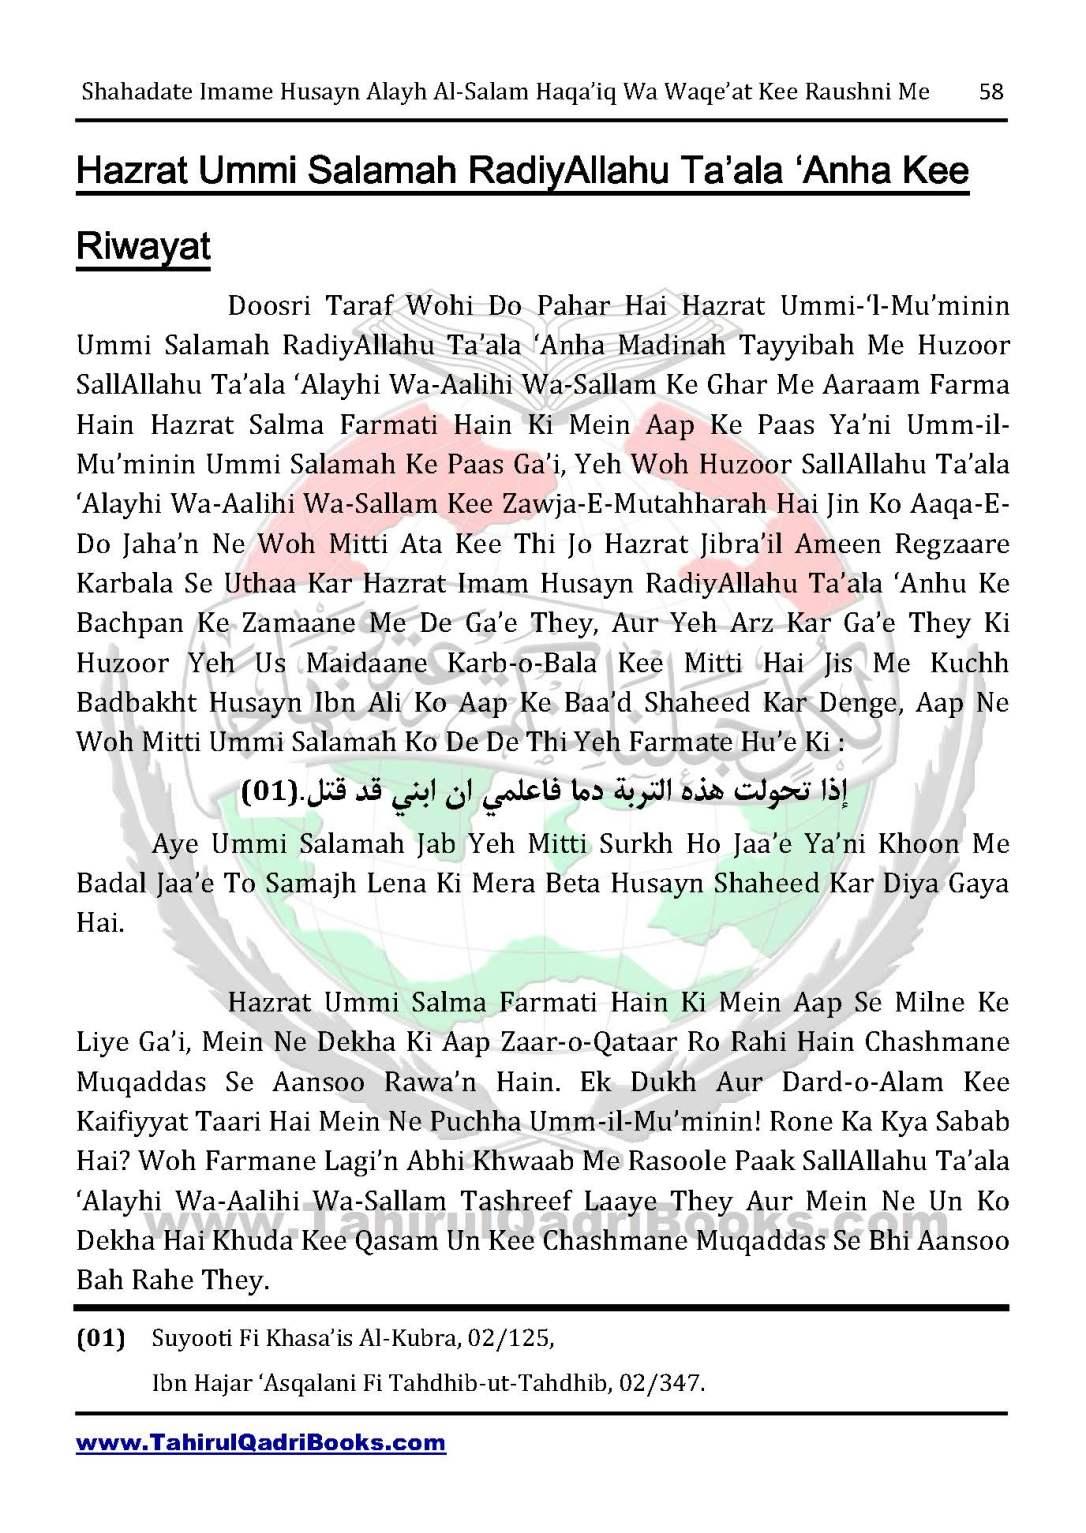 shahadate-imame-husayn-alayh-is-salam-haqaiq-wa-waqe_at-kee-raushni-me-in-roman-urdu-unlocked_Page_58